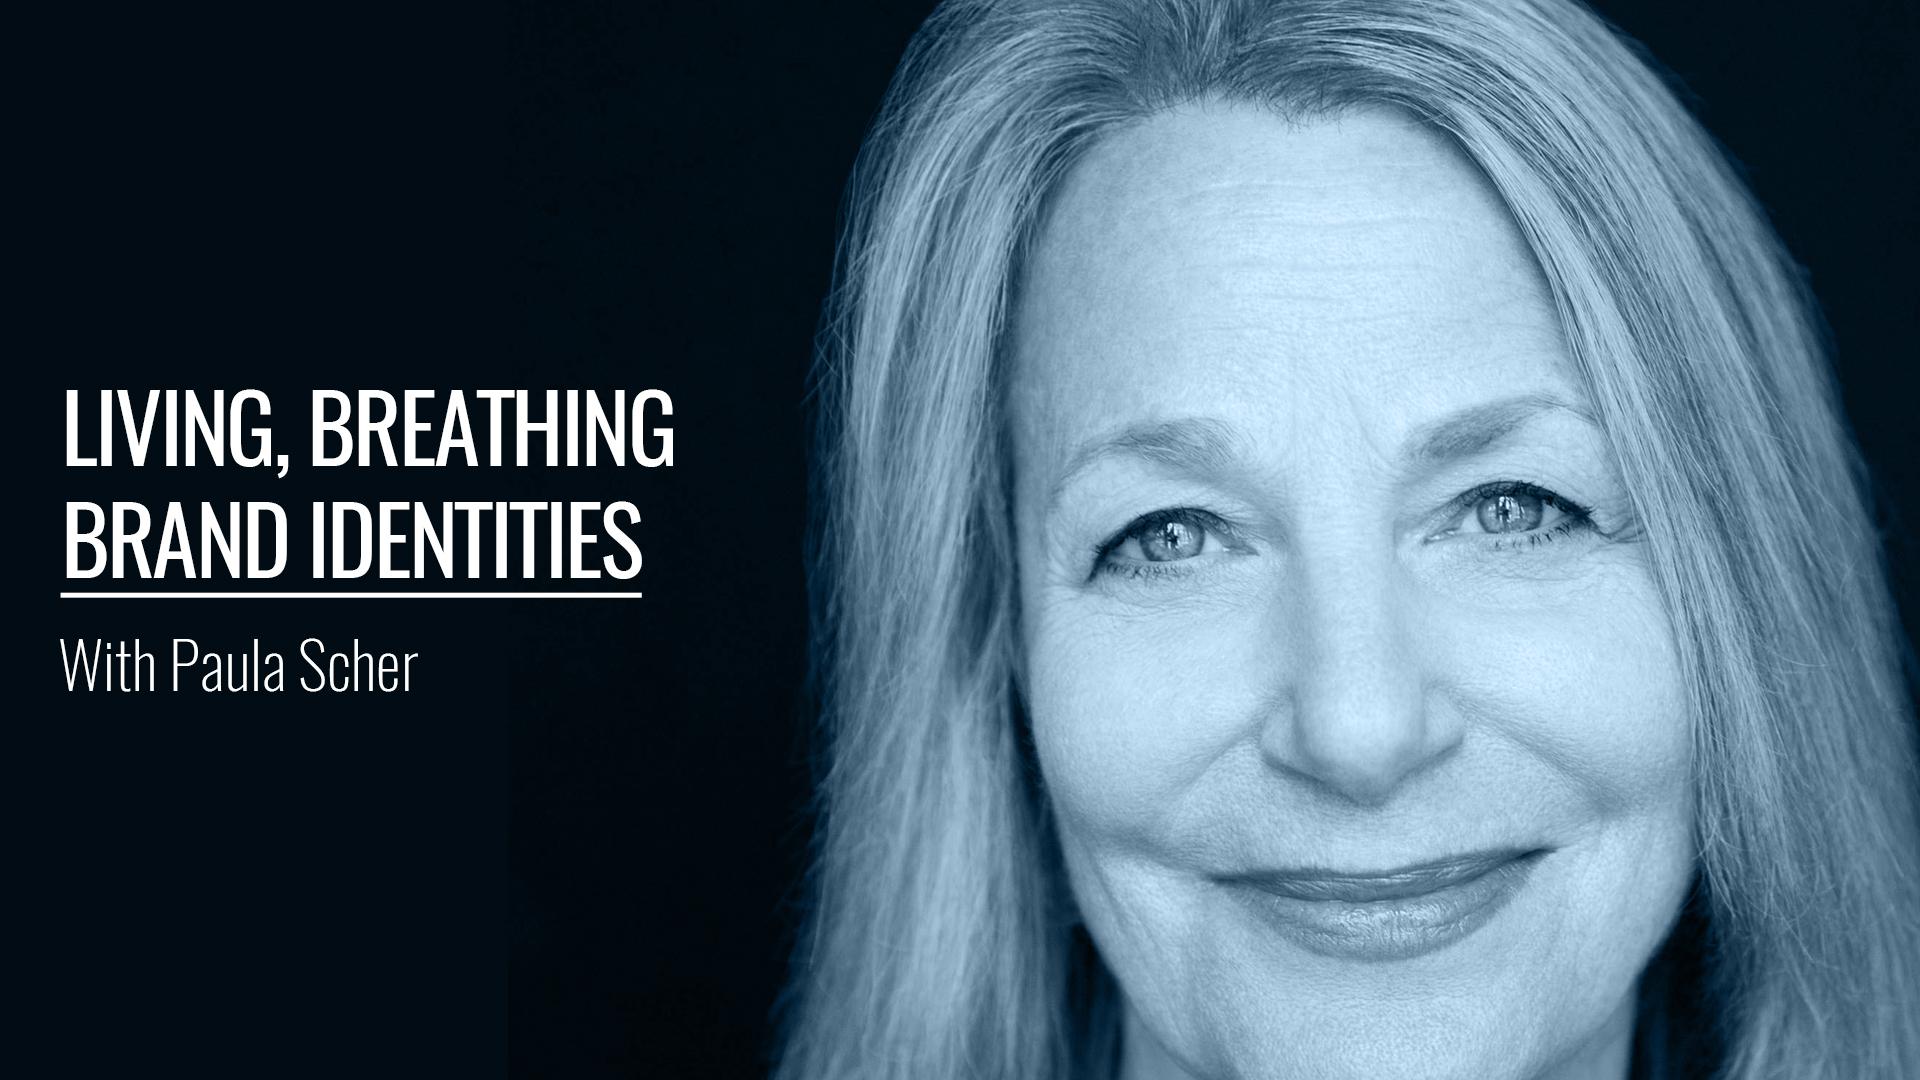 Living, Breathing Brand Identities With Paula Scher